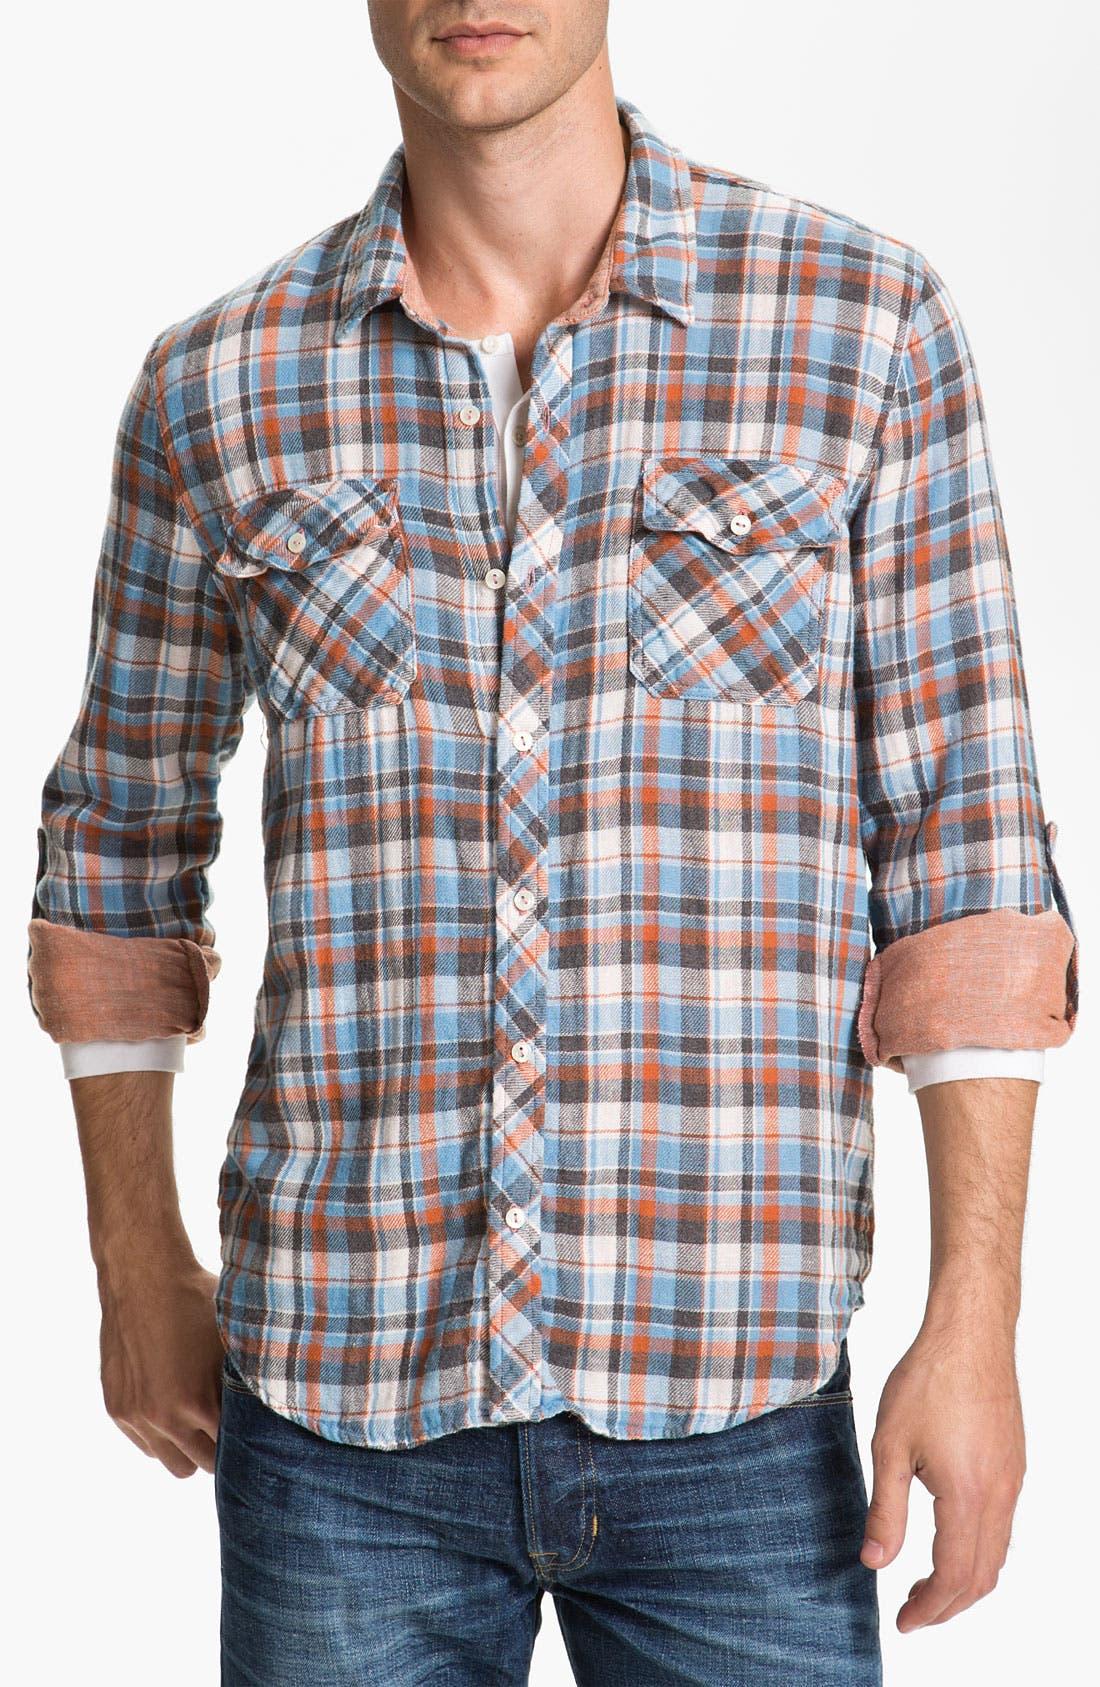 Alternate Image 1 Selected - Splendid Mills 'Cliff' Plaid Cotton Flannel Shirt